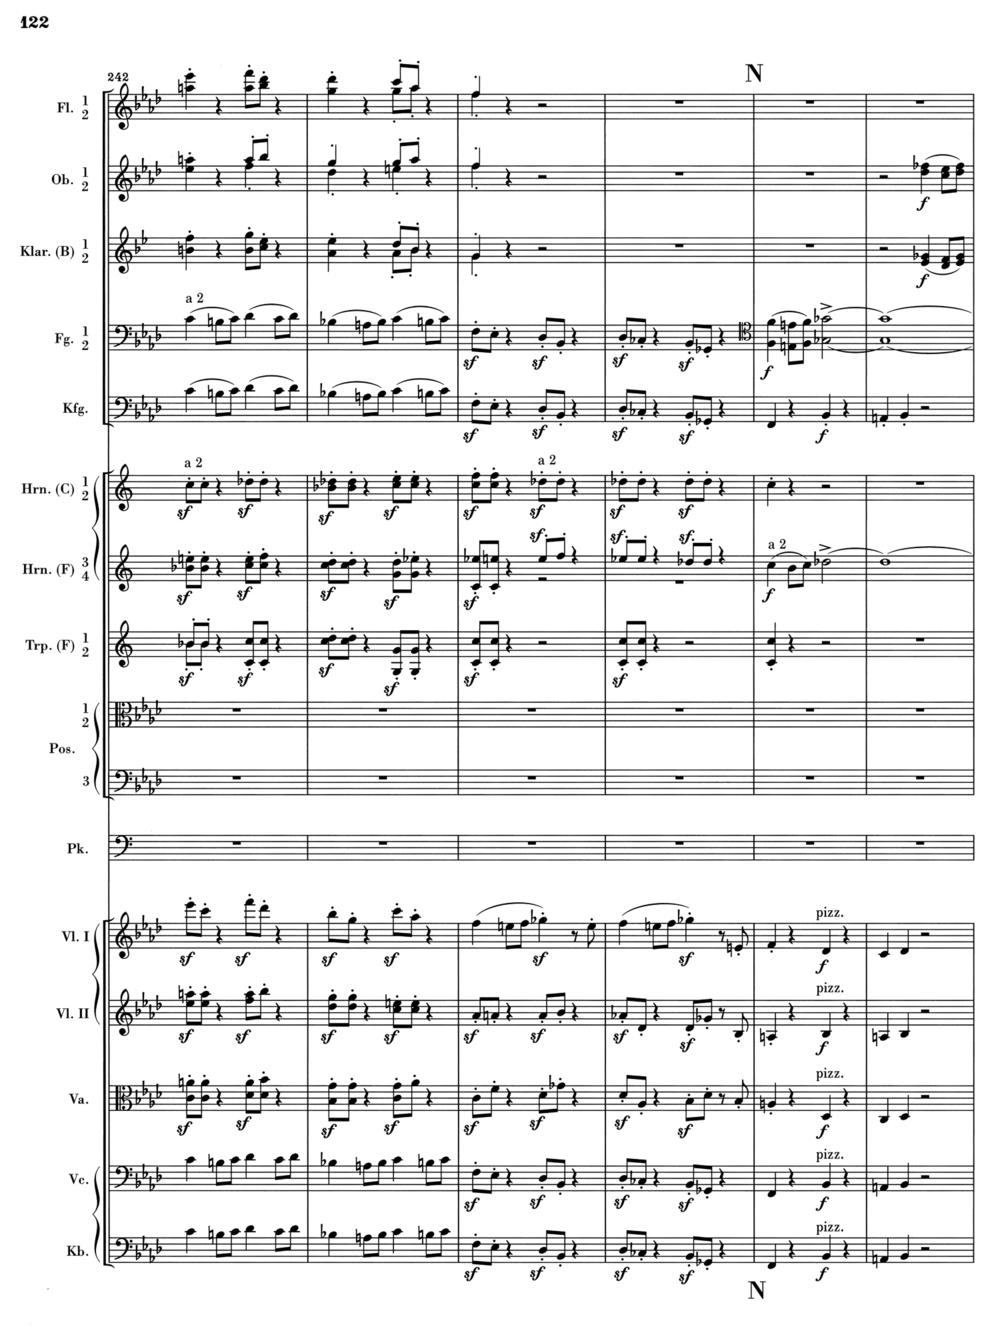 Brahms 3 Score 15.jpg